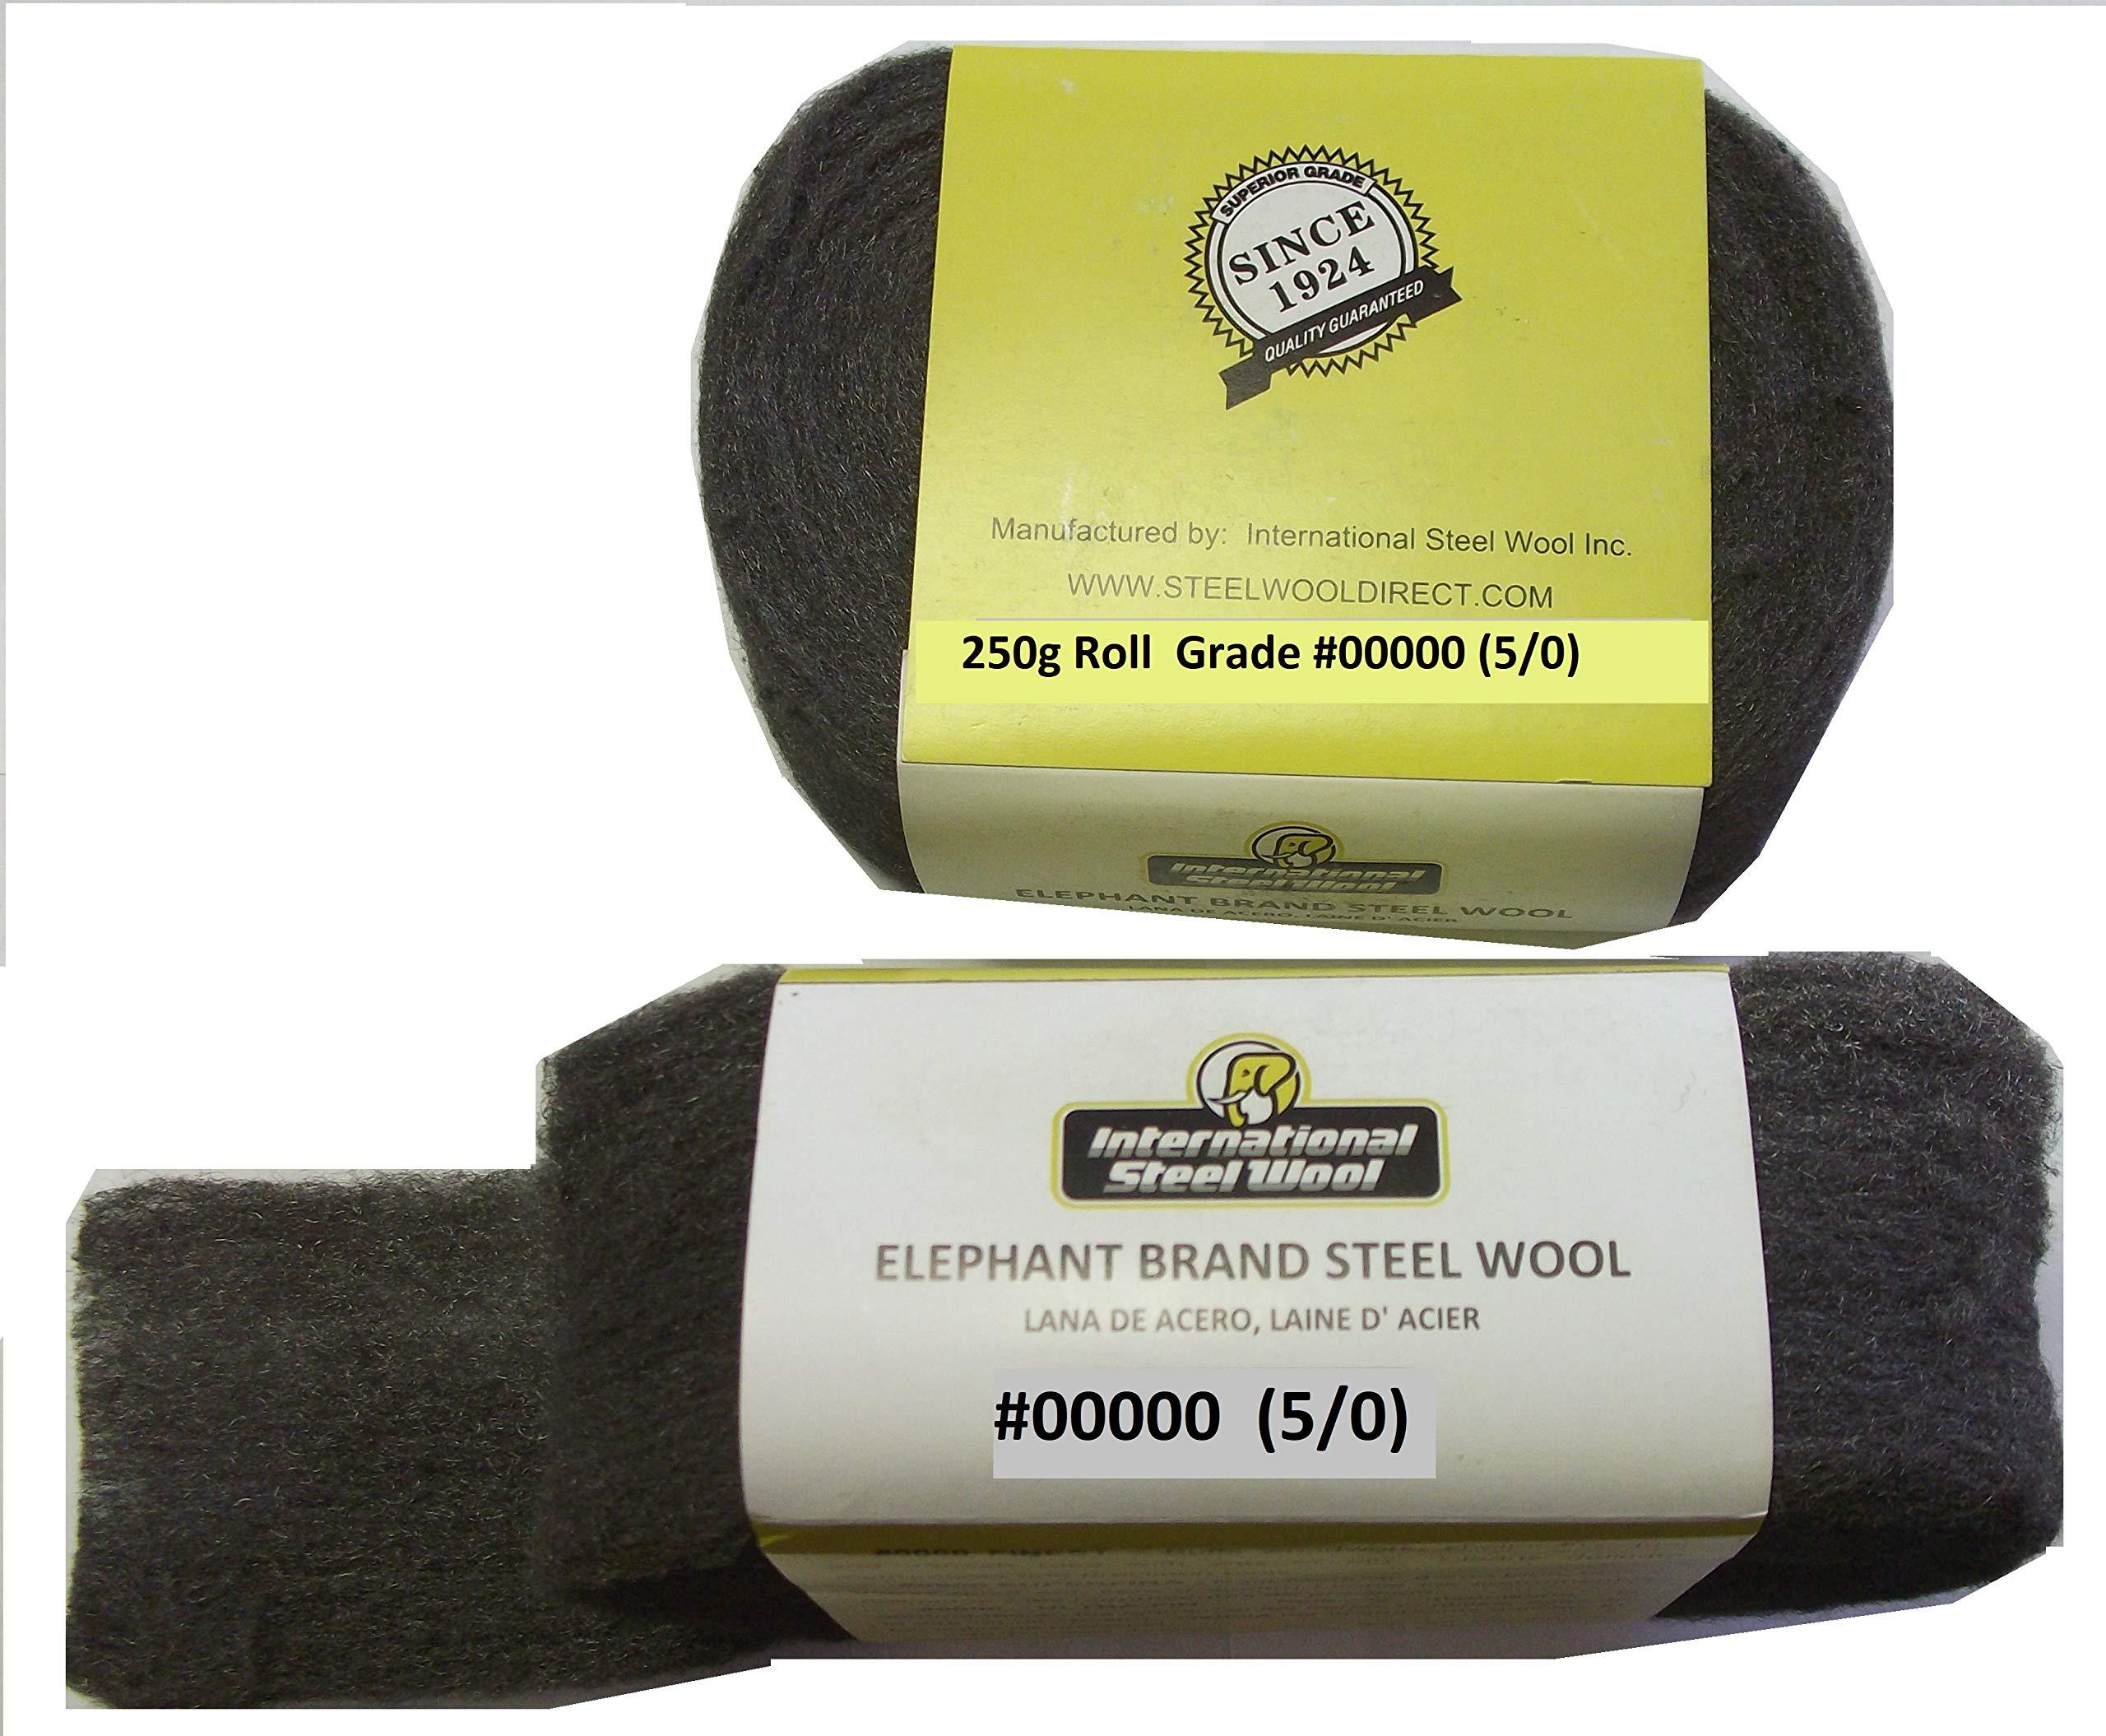 Elephant Brand #00000 Steel Wool, Professional Grade: 250g Project Roll by Elephant Brand